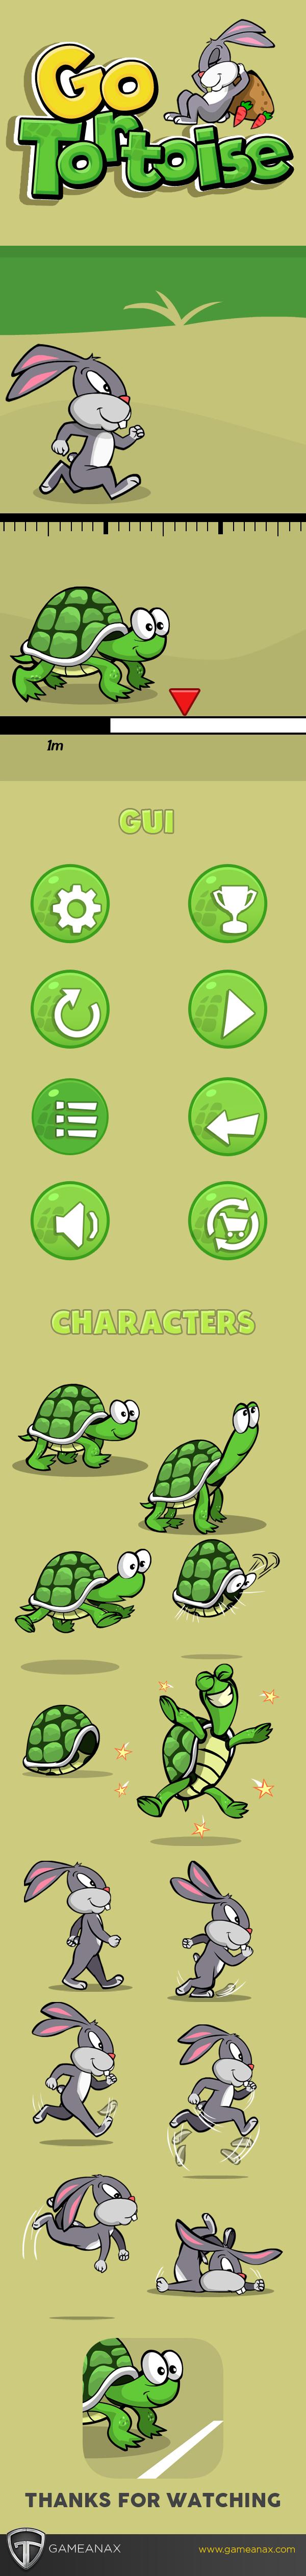 mobile gaming UI ux cartooing race Games iPad iphone